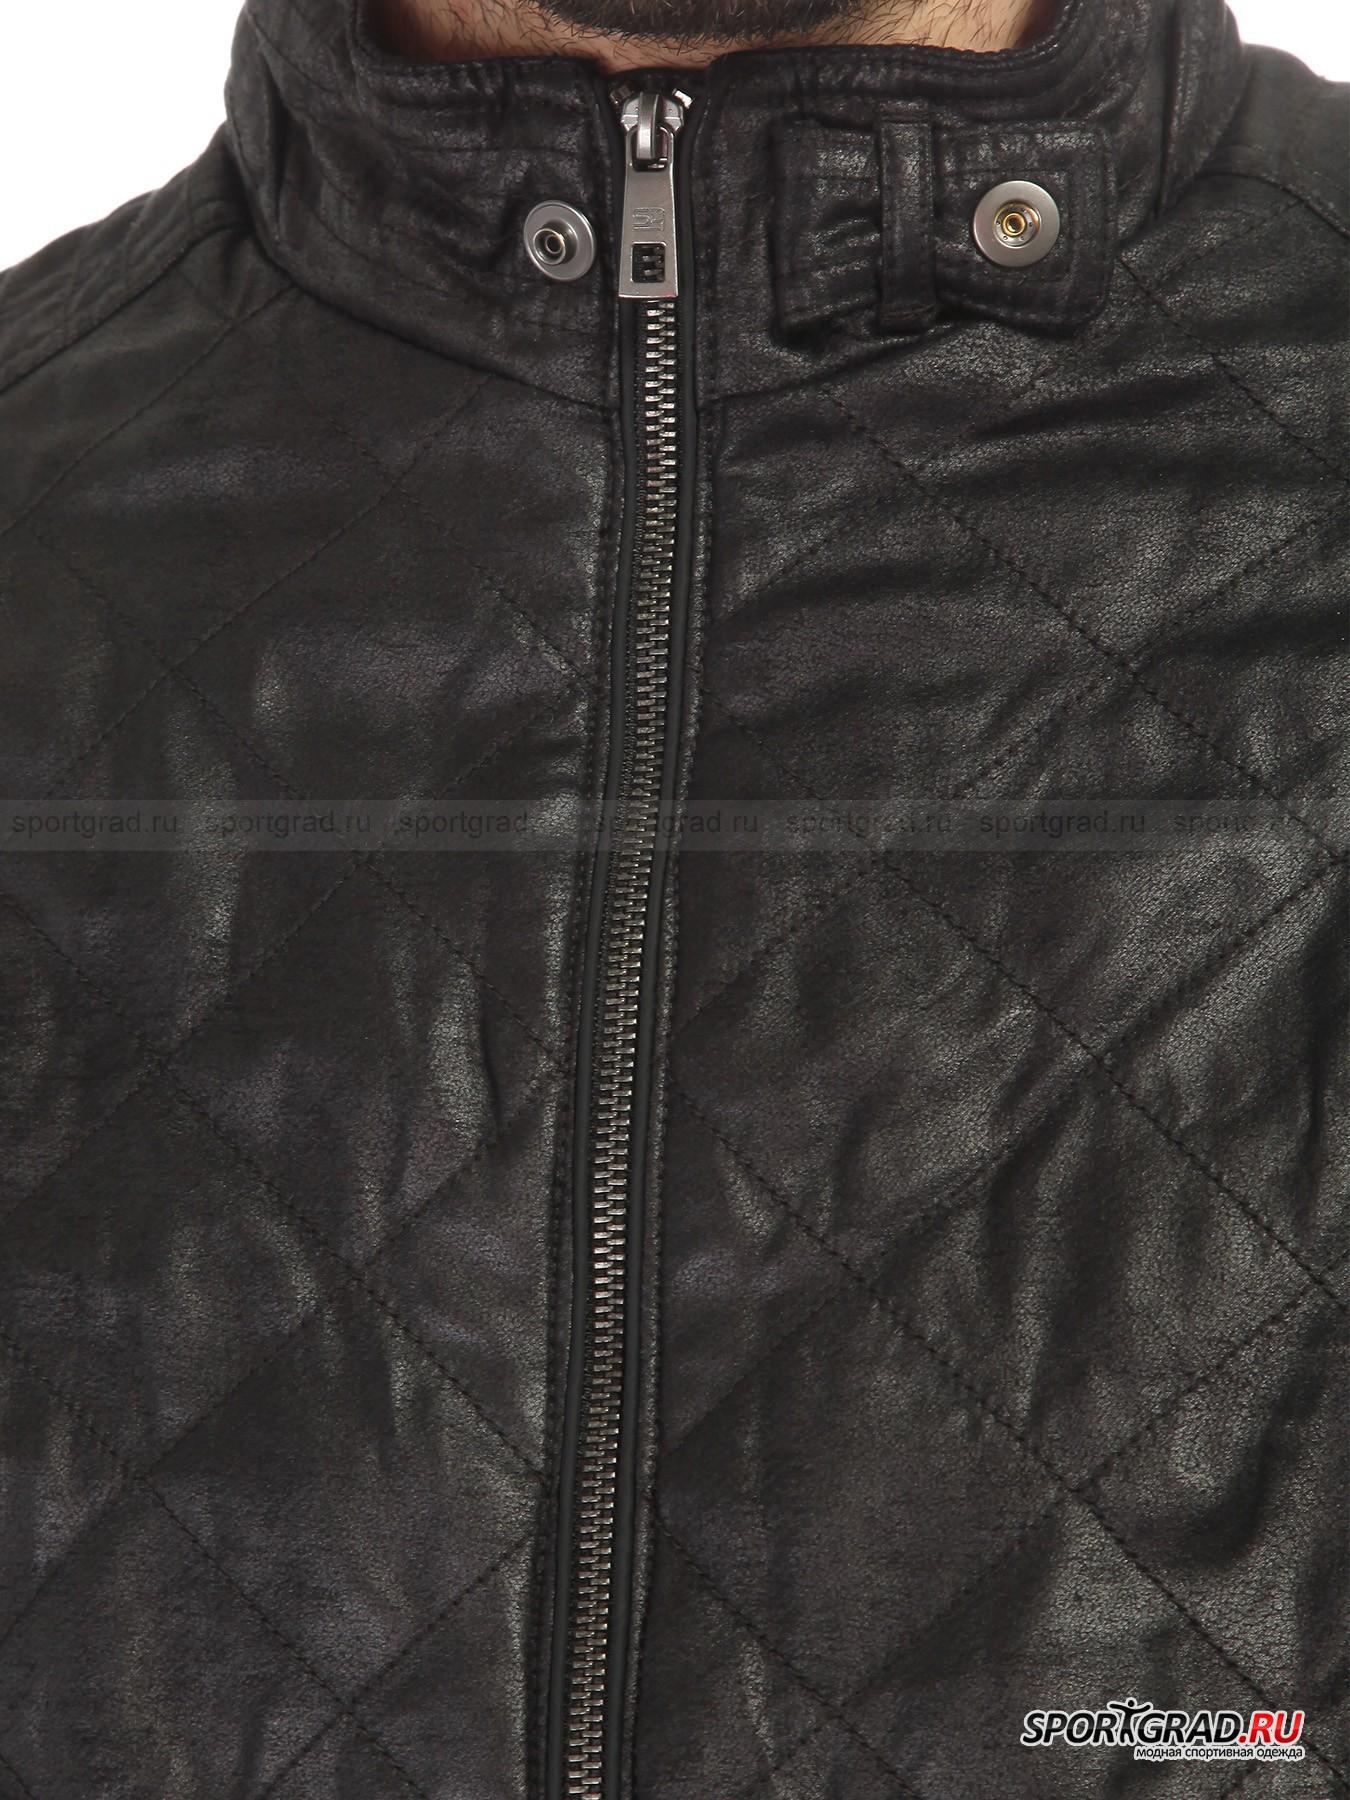 Куртка мужская с утеплителем Harlem 4 S4 от Спортград